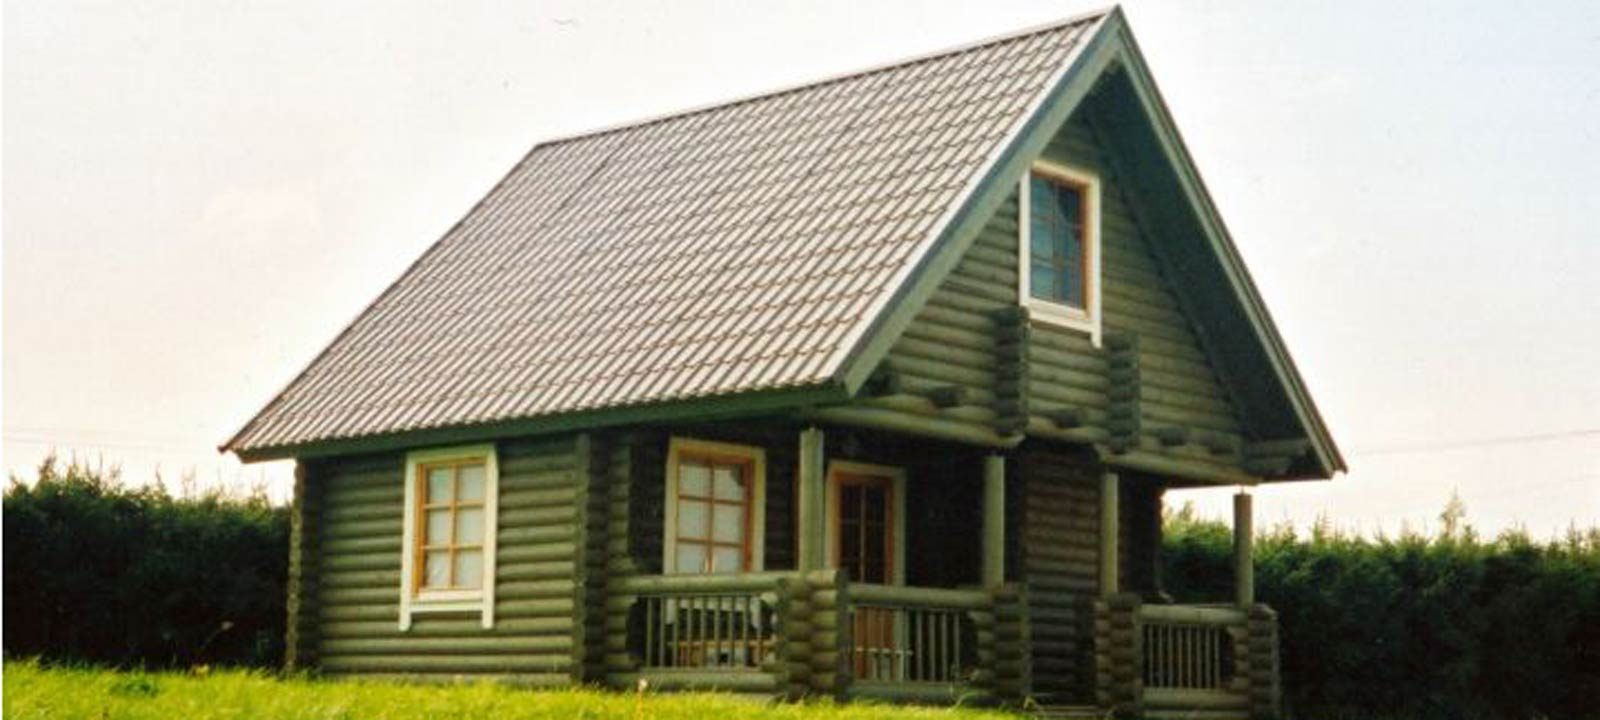 WoodVille Design Blokhut CARIBOO RLR 54M2 Huis